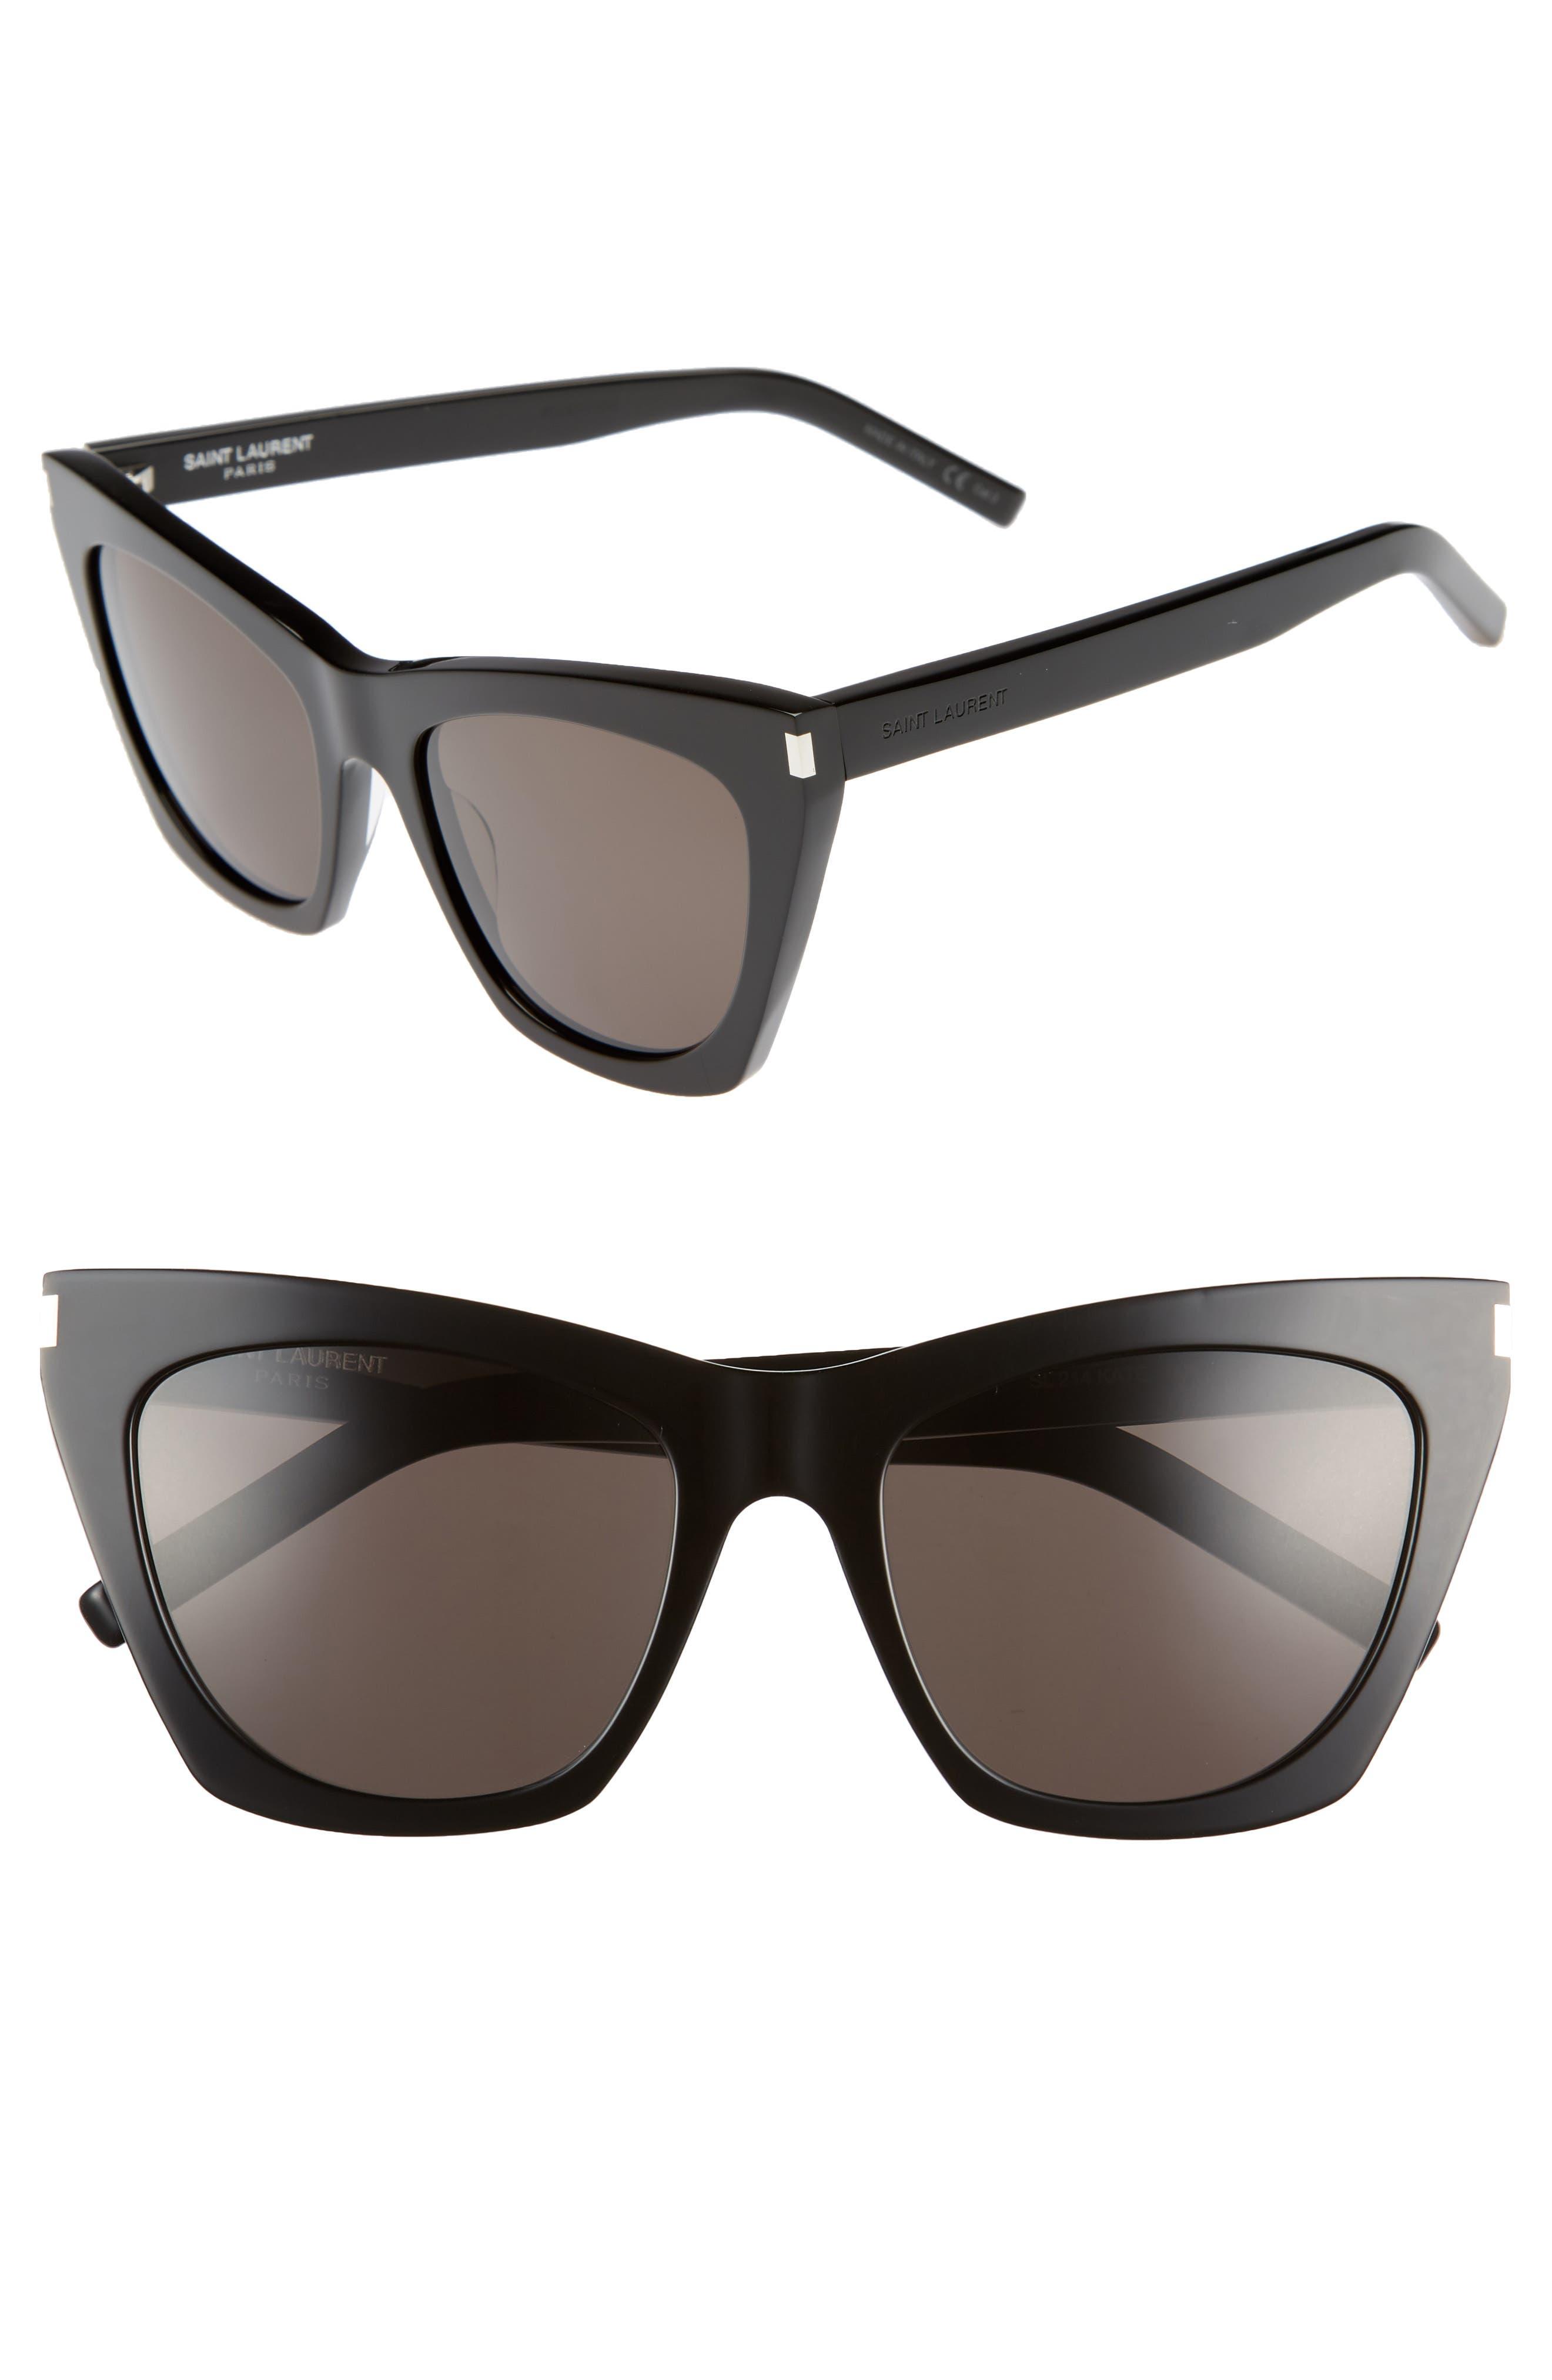 SAINT LAURENT, Kate 55mm Cat Eye Sunglasses, Main thumbnail 1, color, BLACK